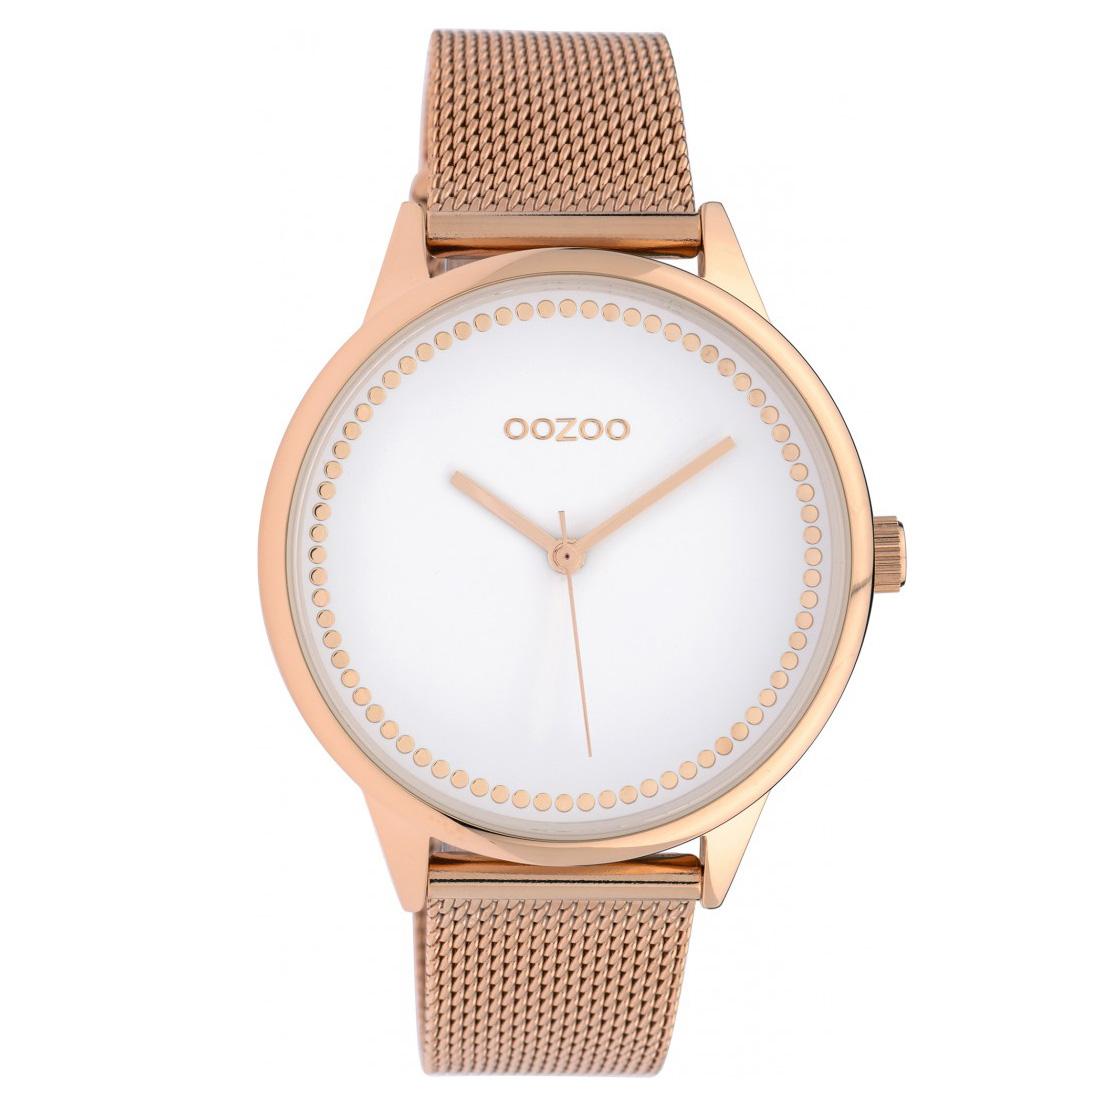 OOZOO C10094 Horloge Timepieces Collection staal rosekleurig 40 mm